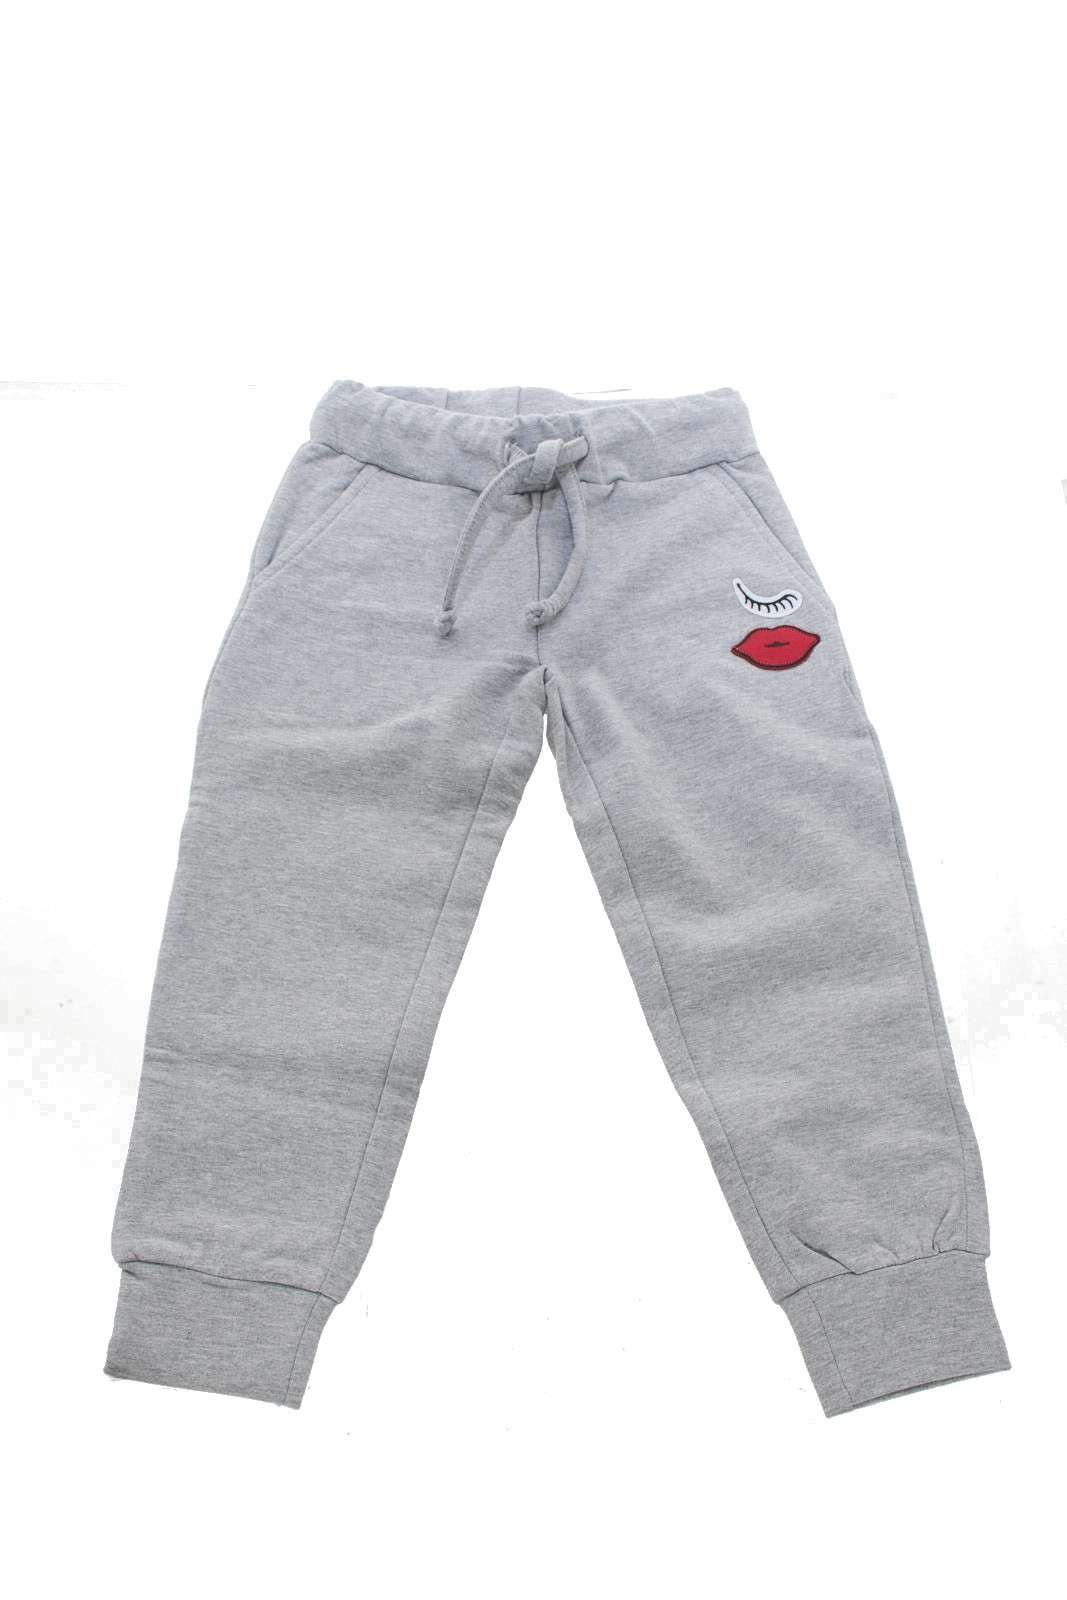 https://www.parmax.com/media/catalog/product/a/i/AI-outlet_parmax-pantaloni-bambina-Silvia%20Heach-skbif0007-A.jpg